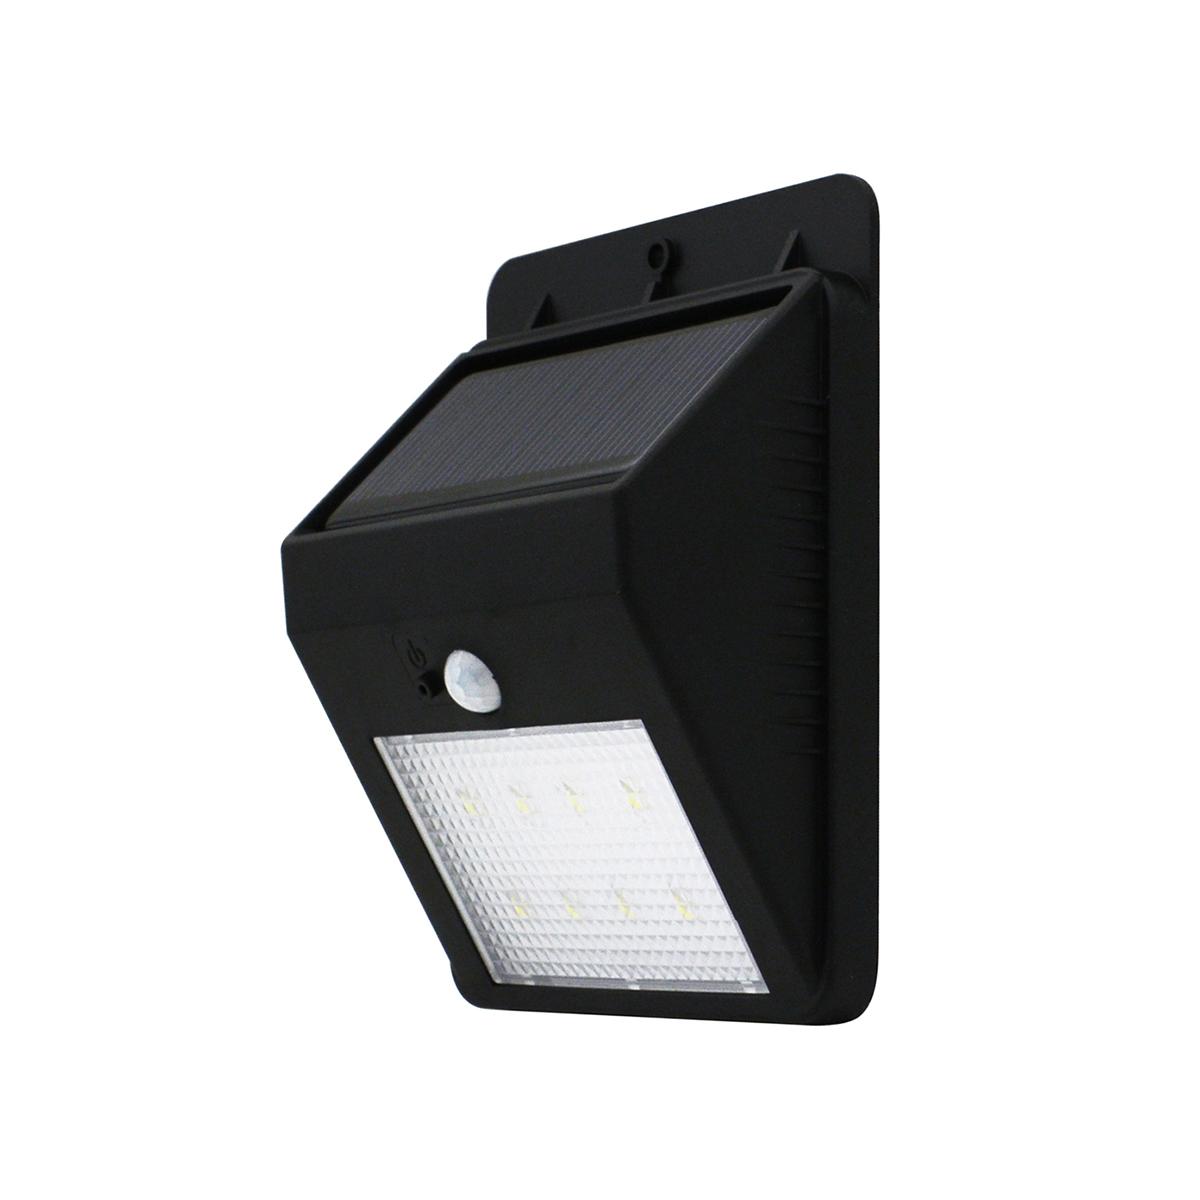 1.6W 160LM 6500K 8-LED Light+Infrared Sensor Controlled Solar Powered LED Light Lamp for Garden Path Fence Corridor Wall (White)